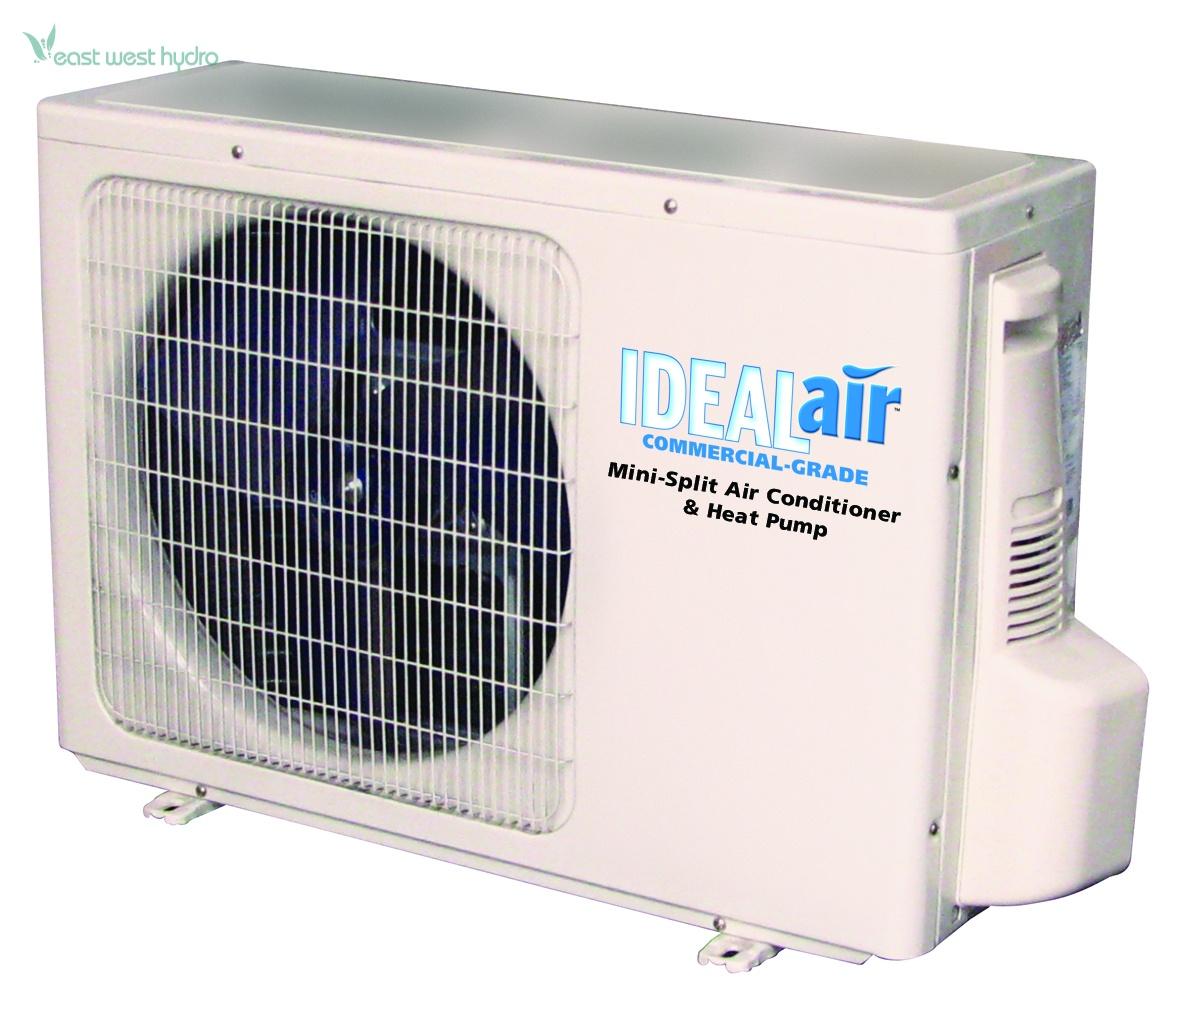 Ideal Air Mini Split 12000 BTU 13 SEER (700485) EastWestHydro #086AC3